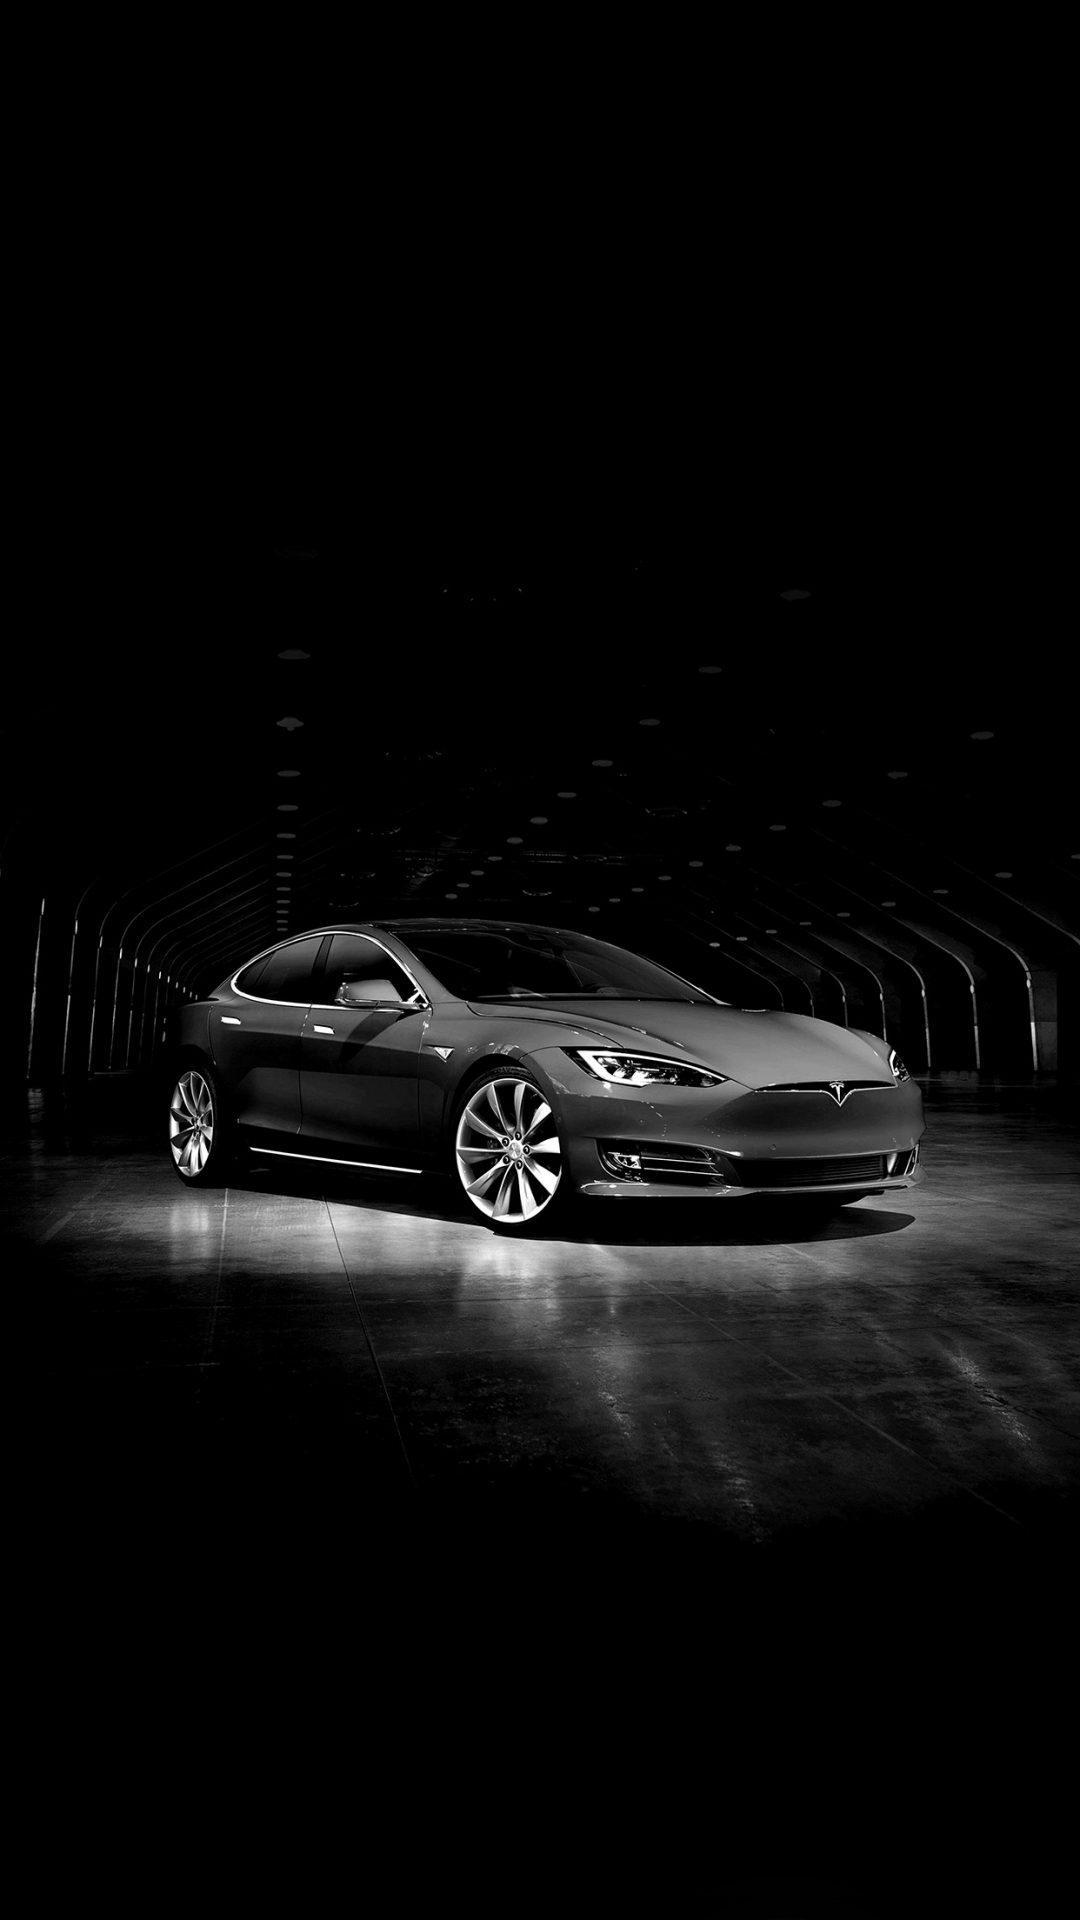 Tesla Model Dark Bw Car